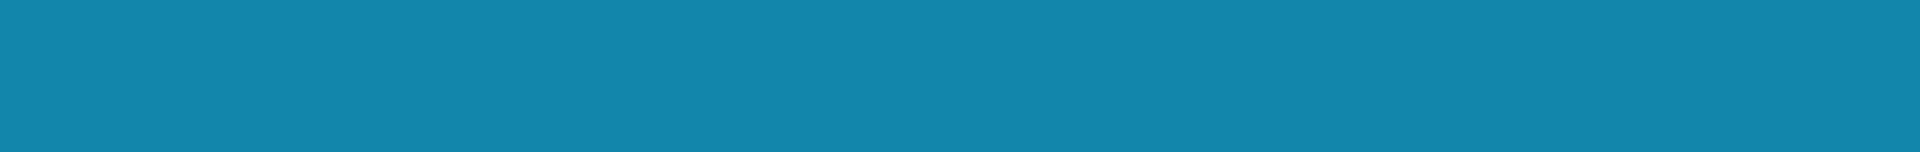 separation bleu